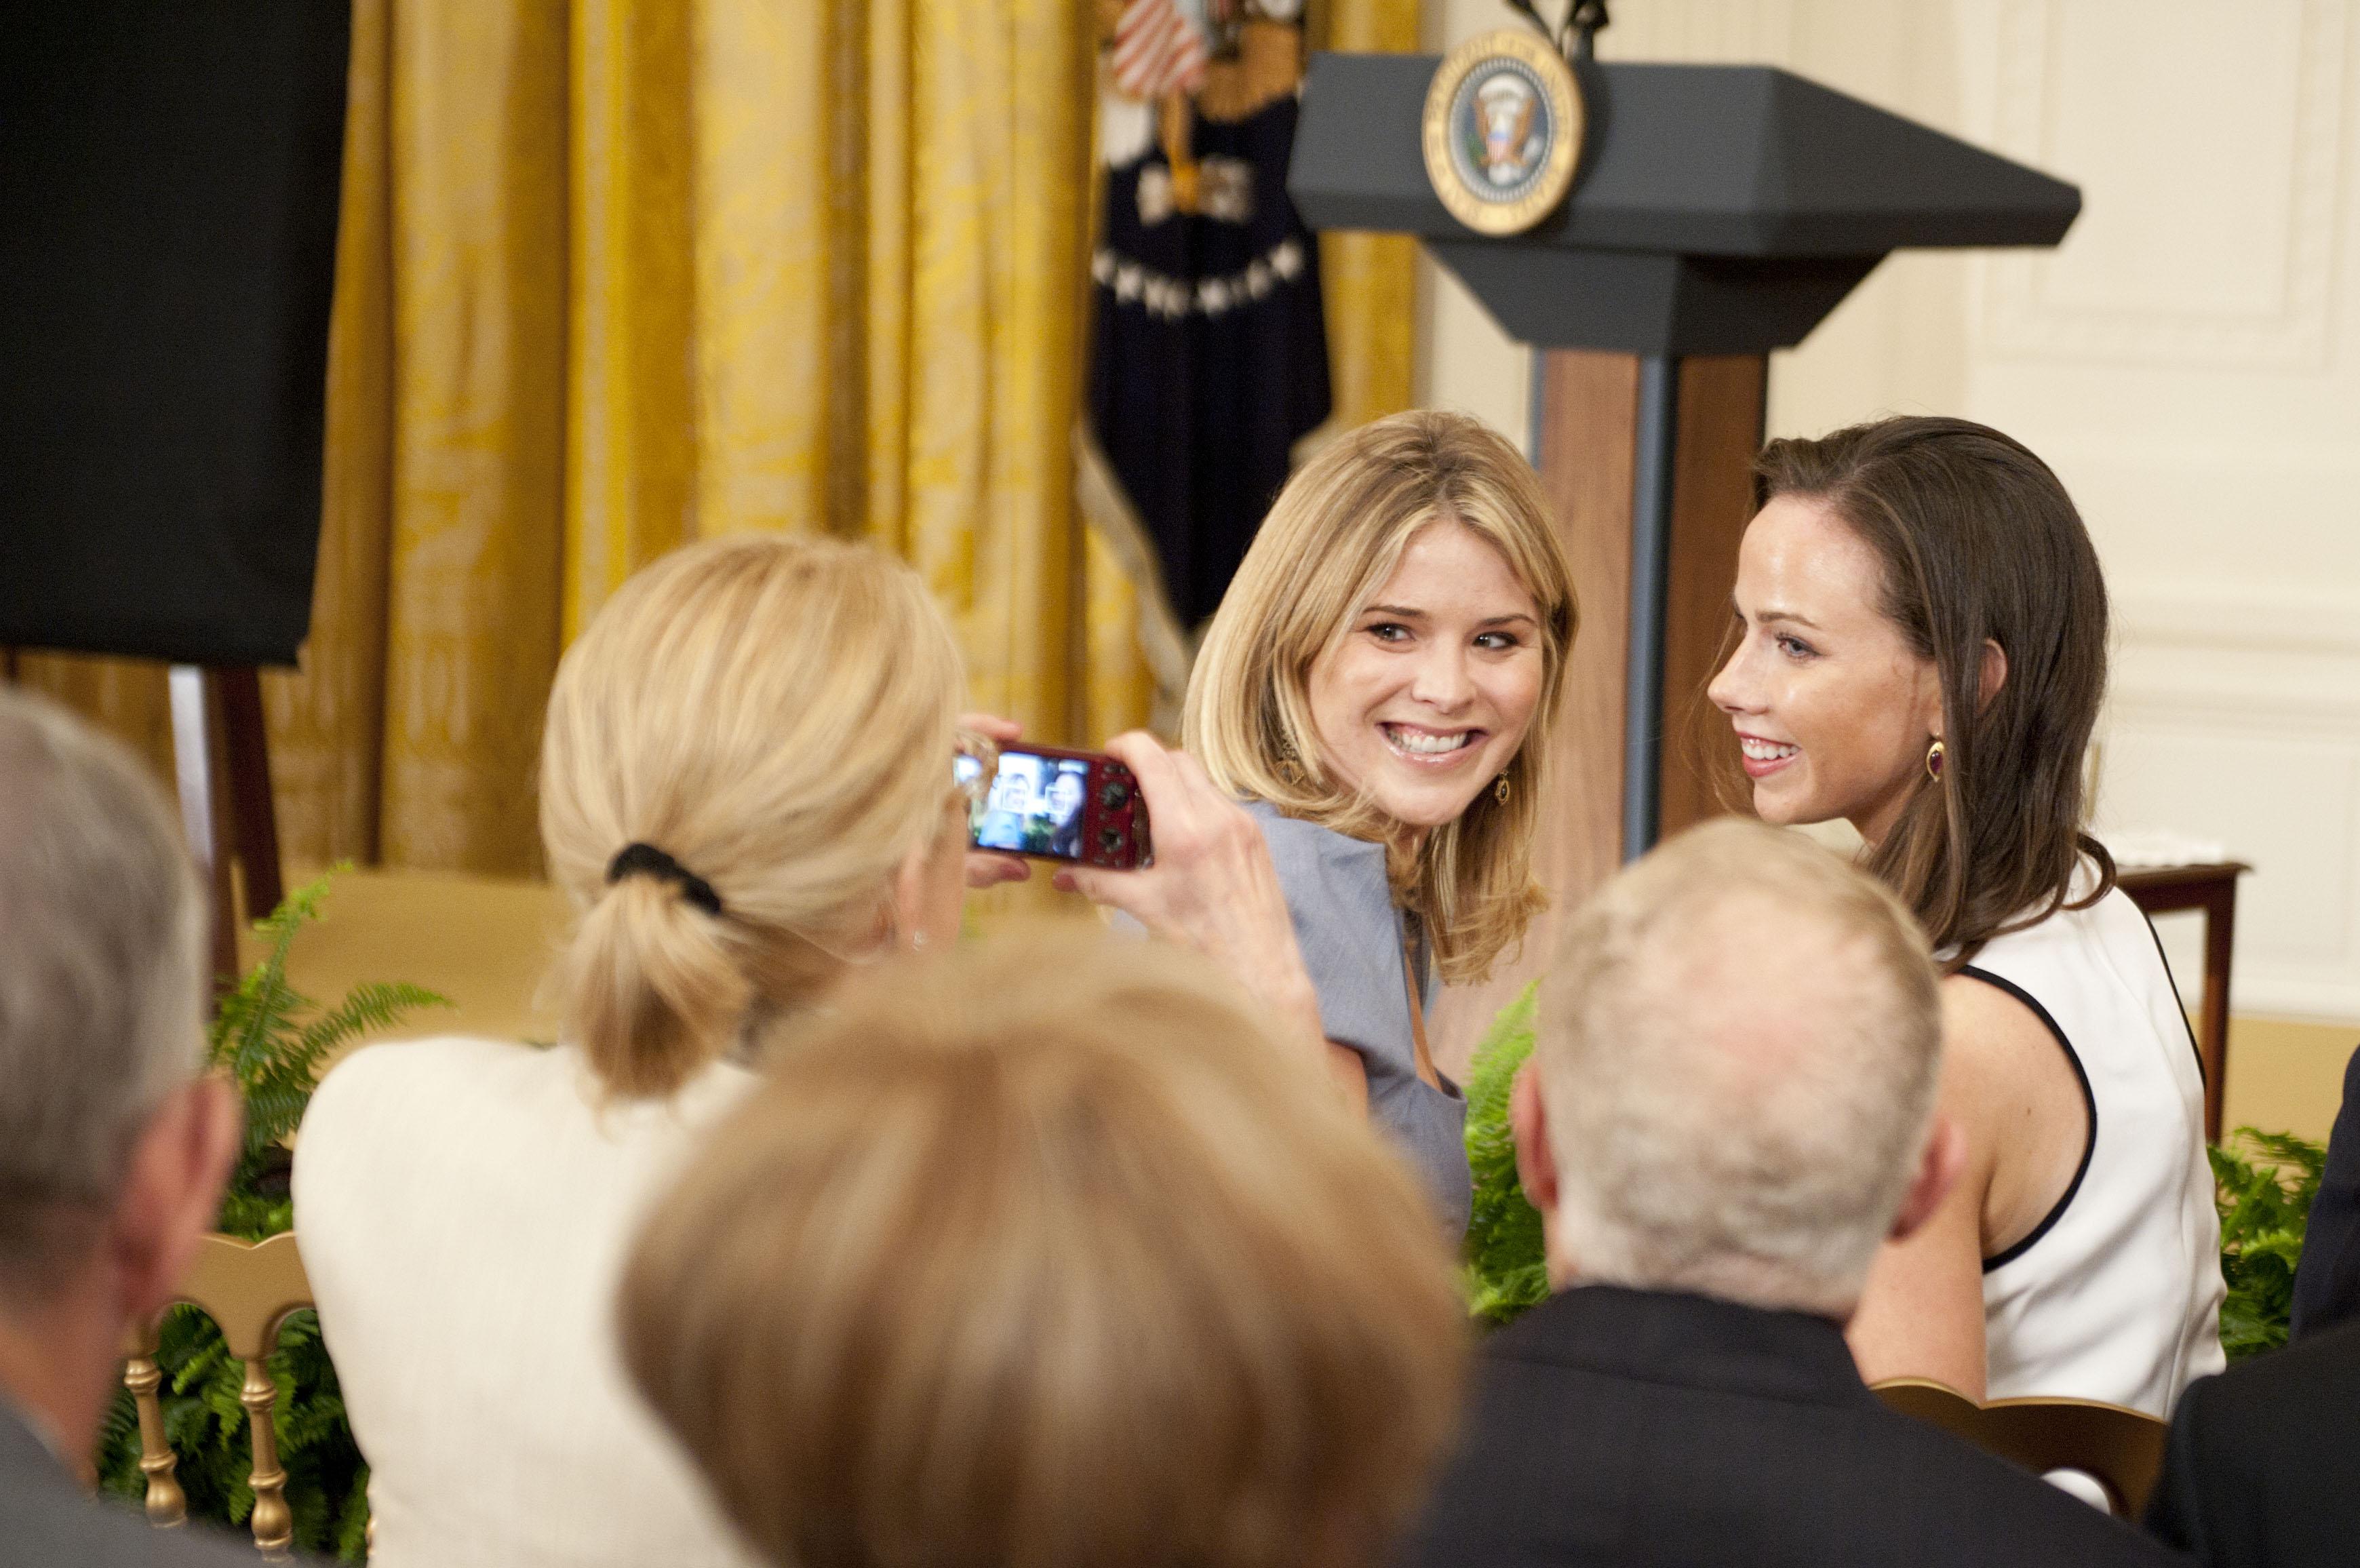 George W. Bush And Laura Bush White House Portrait Unveiling